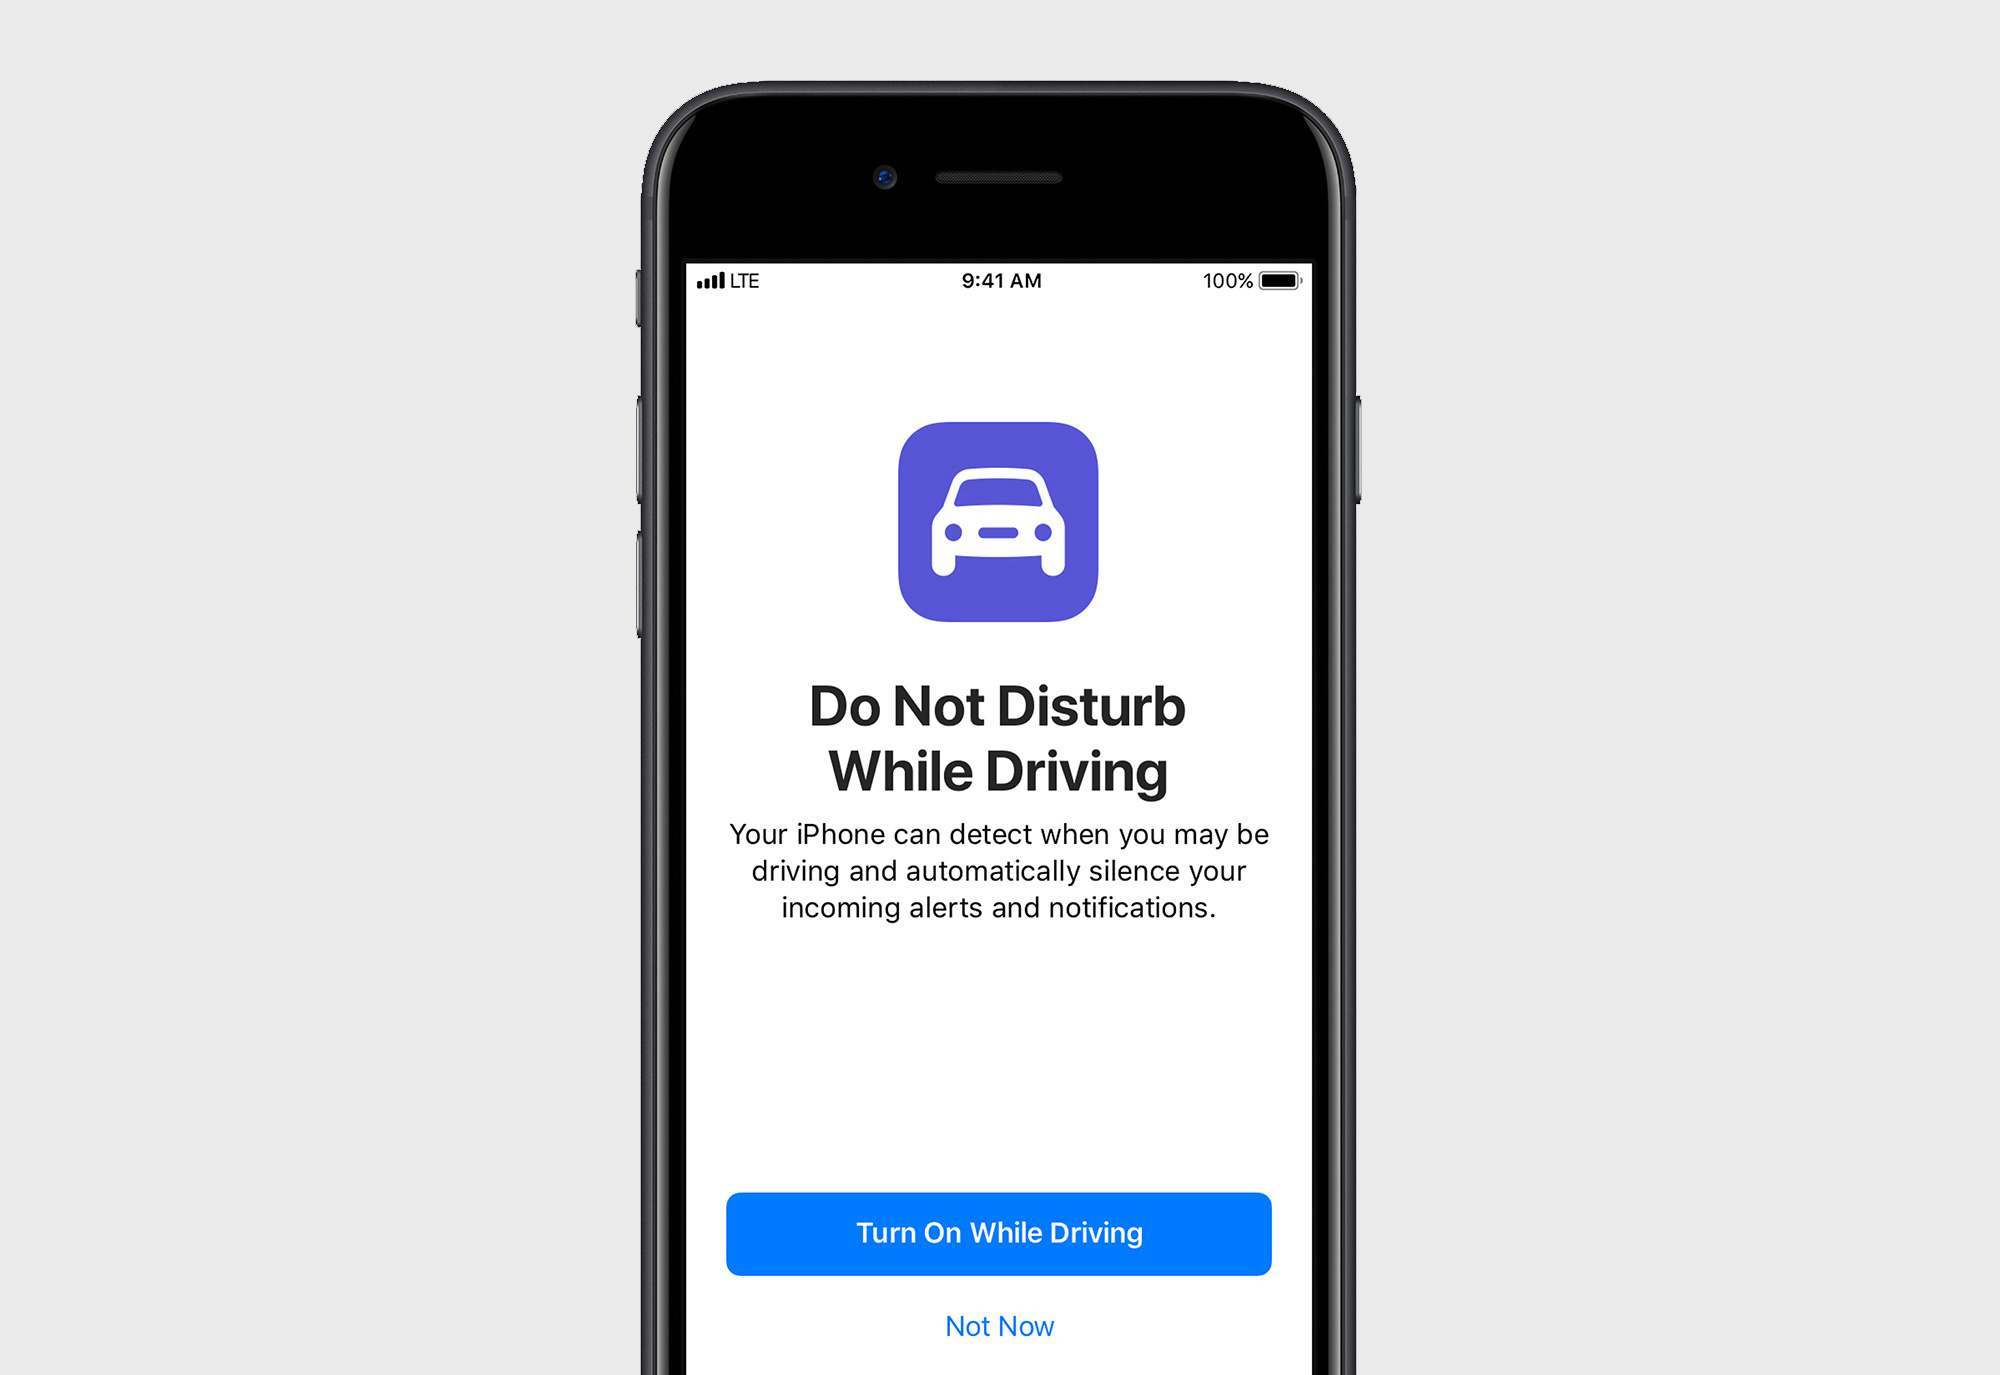 ios_iphone_do_not_disturb_driving_1.jpg